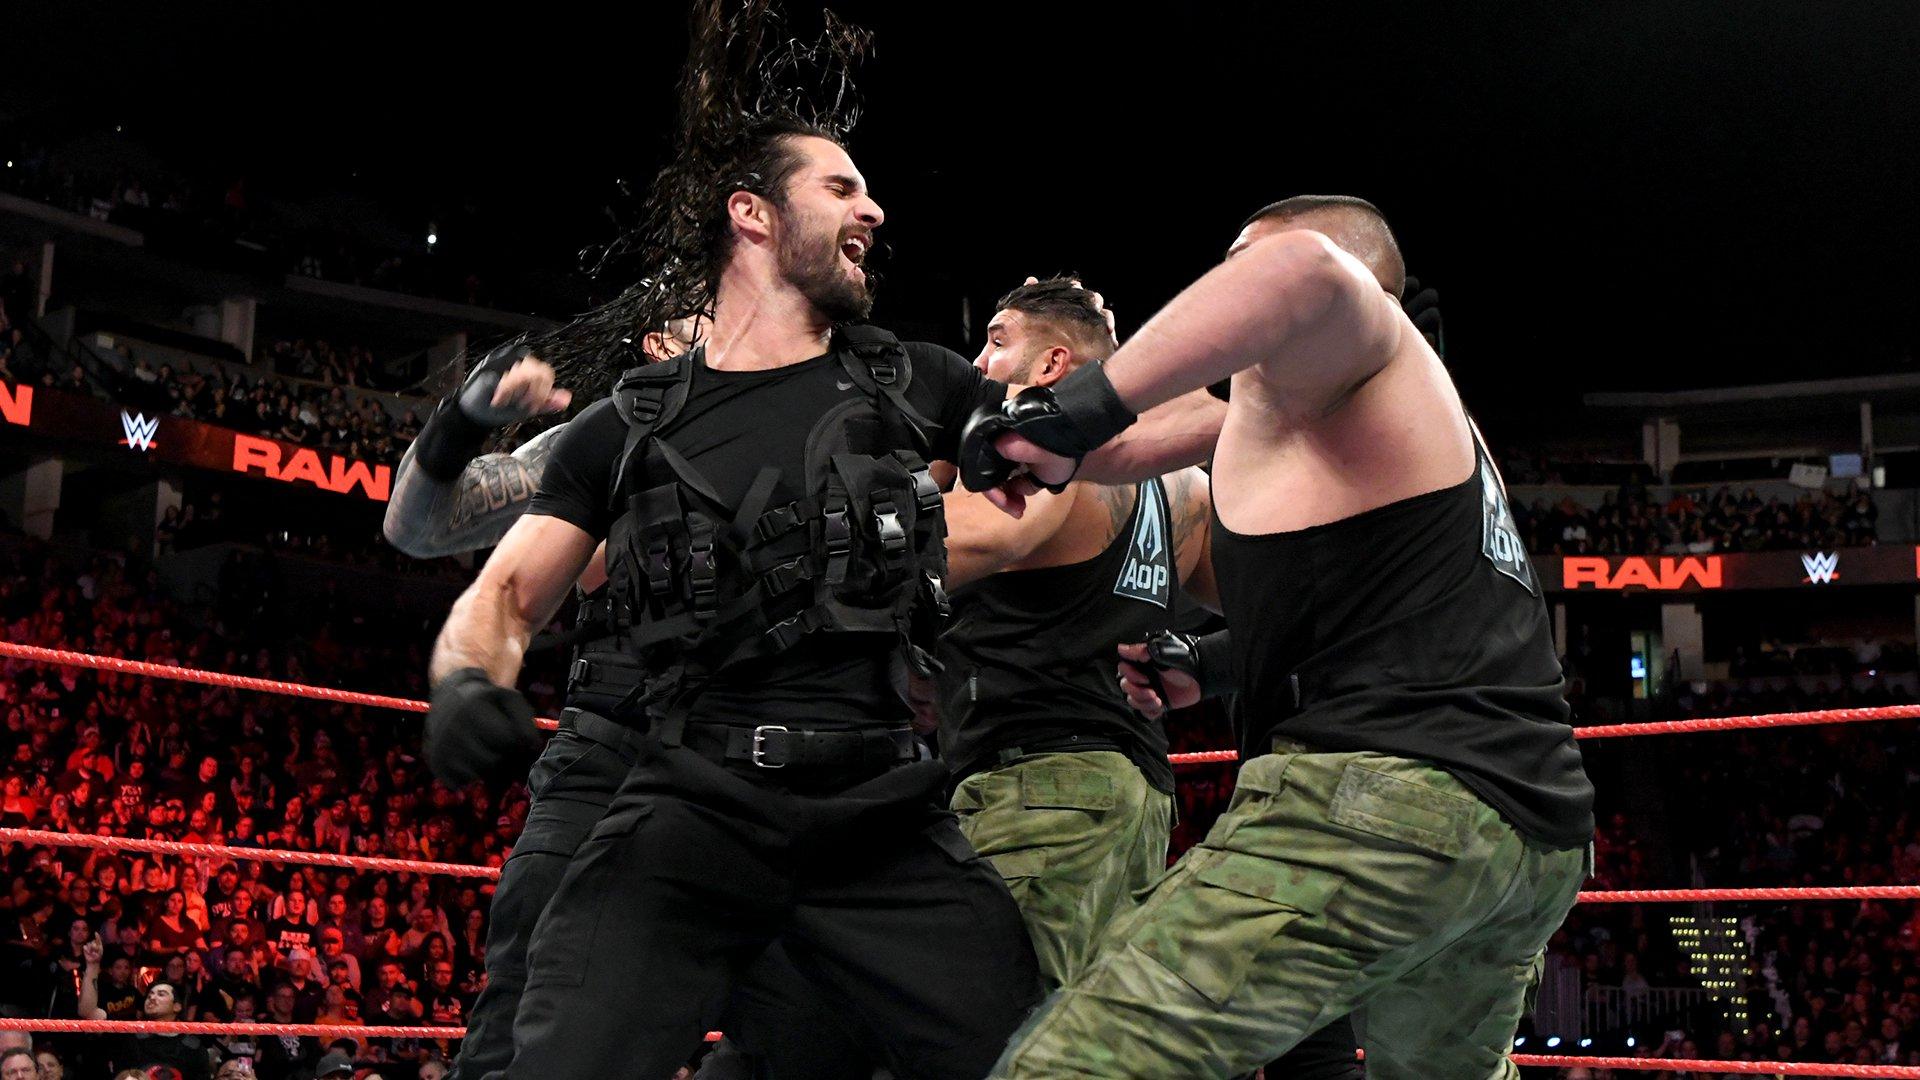 Wwe Raw Sept 24 2018 Wwe